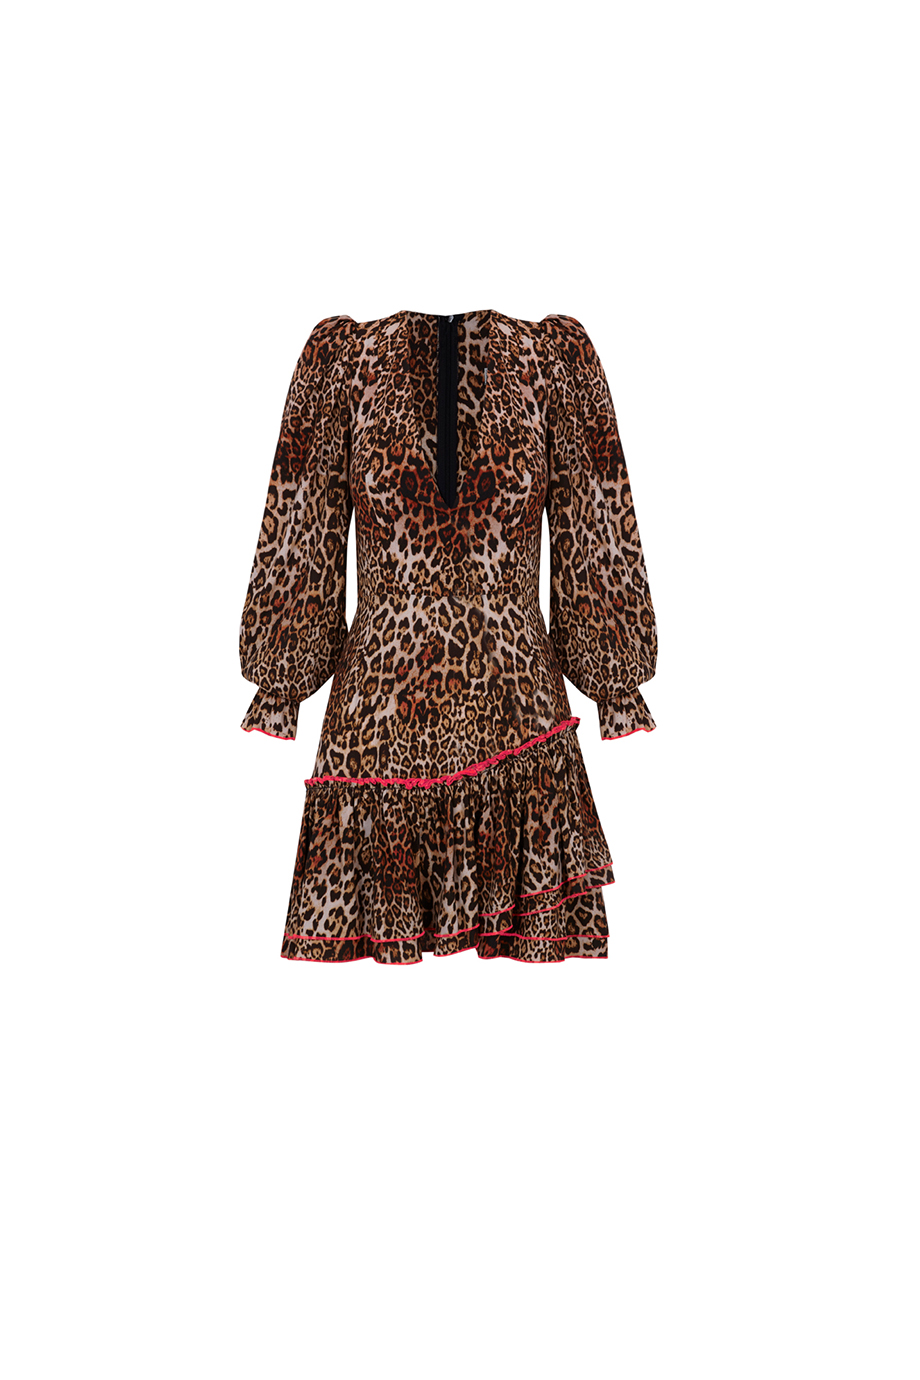 Vestido corto RUSH V Dress by Guts&Love